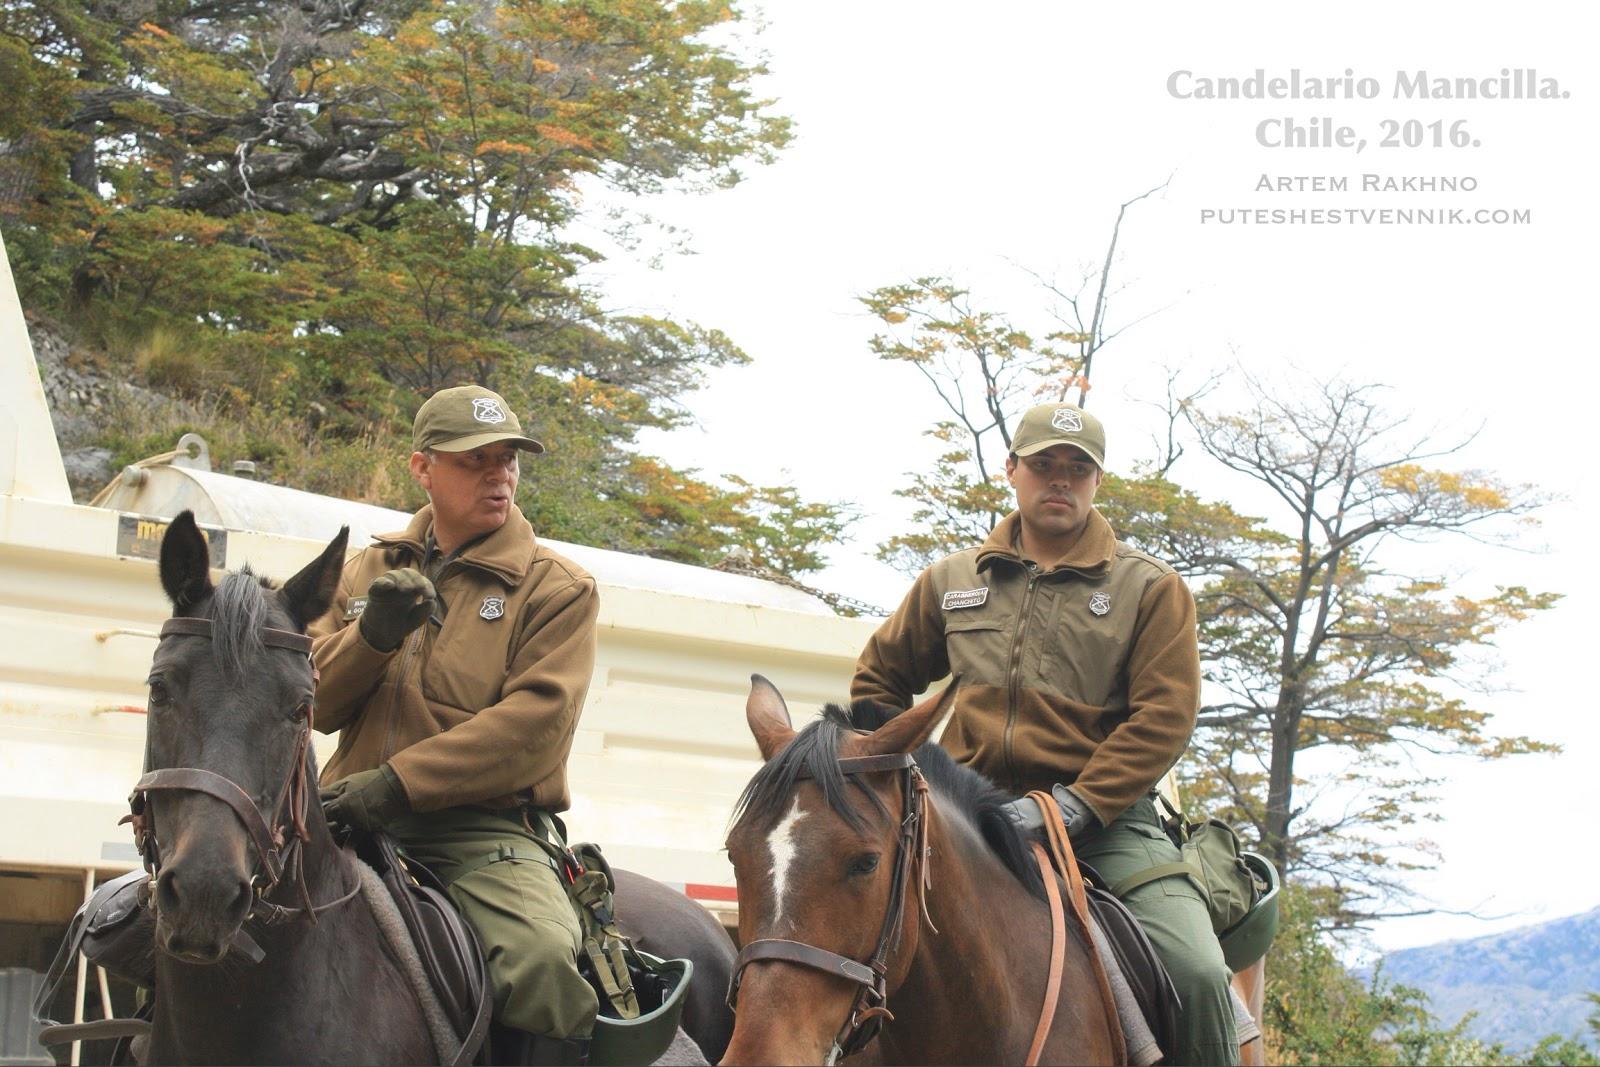 Карабинерос на лошадях